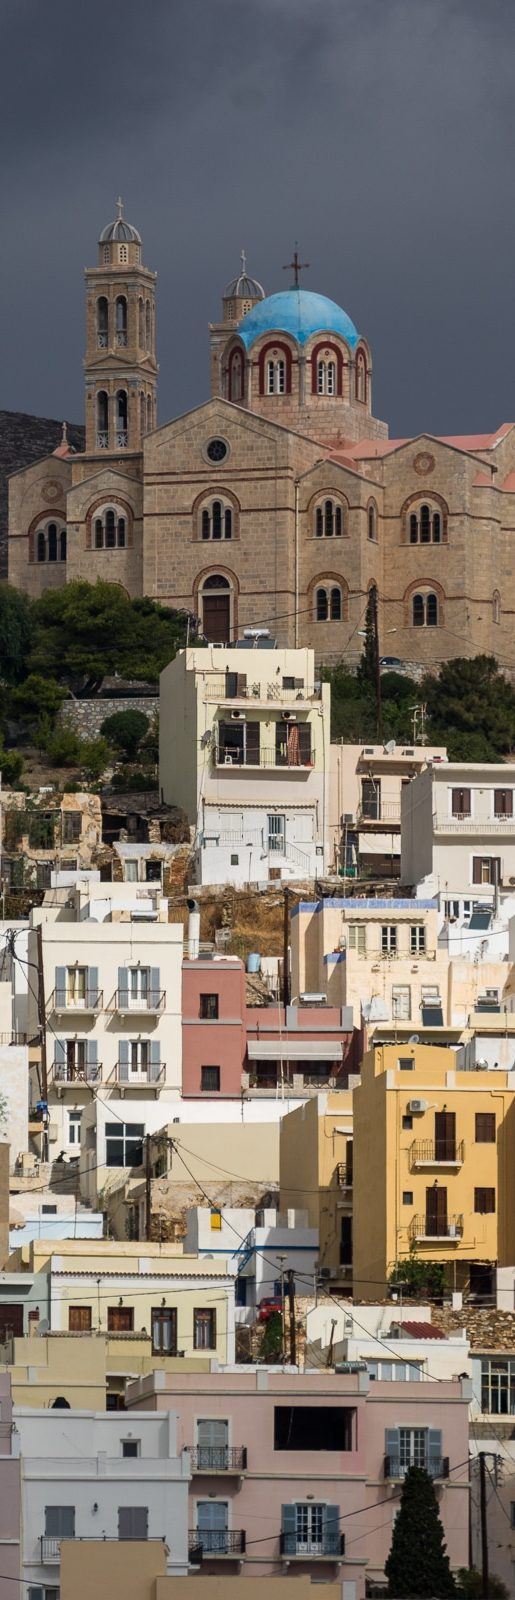 Syros Church of the Resurrection